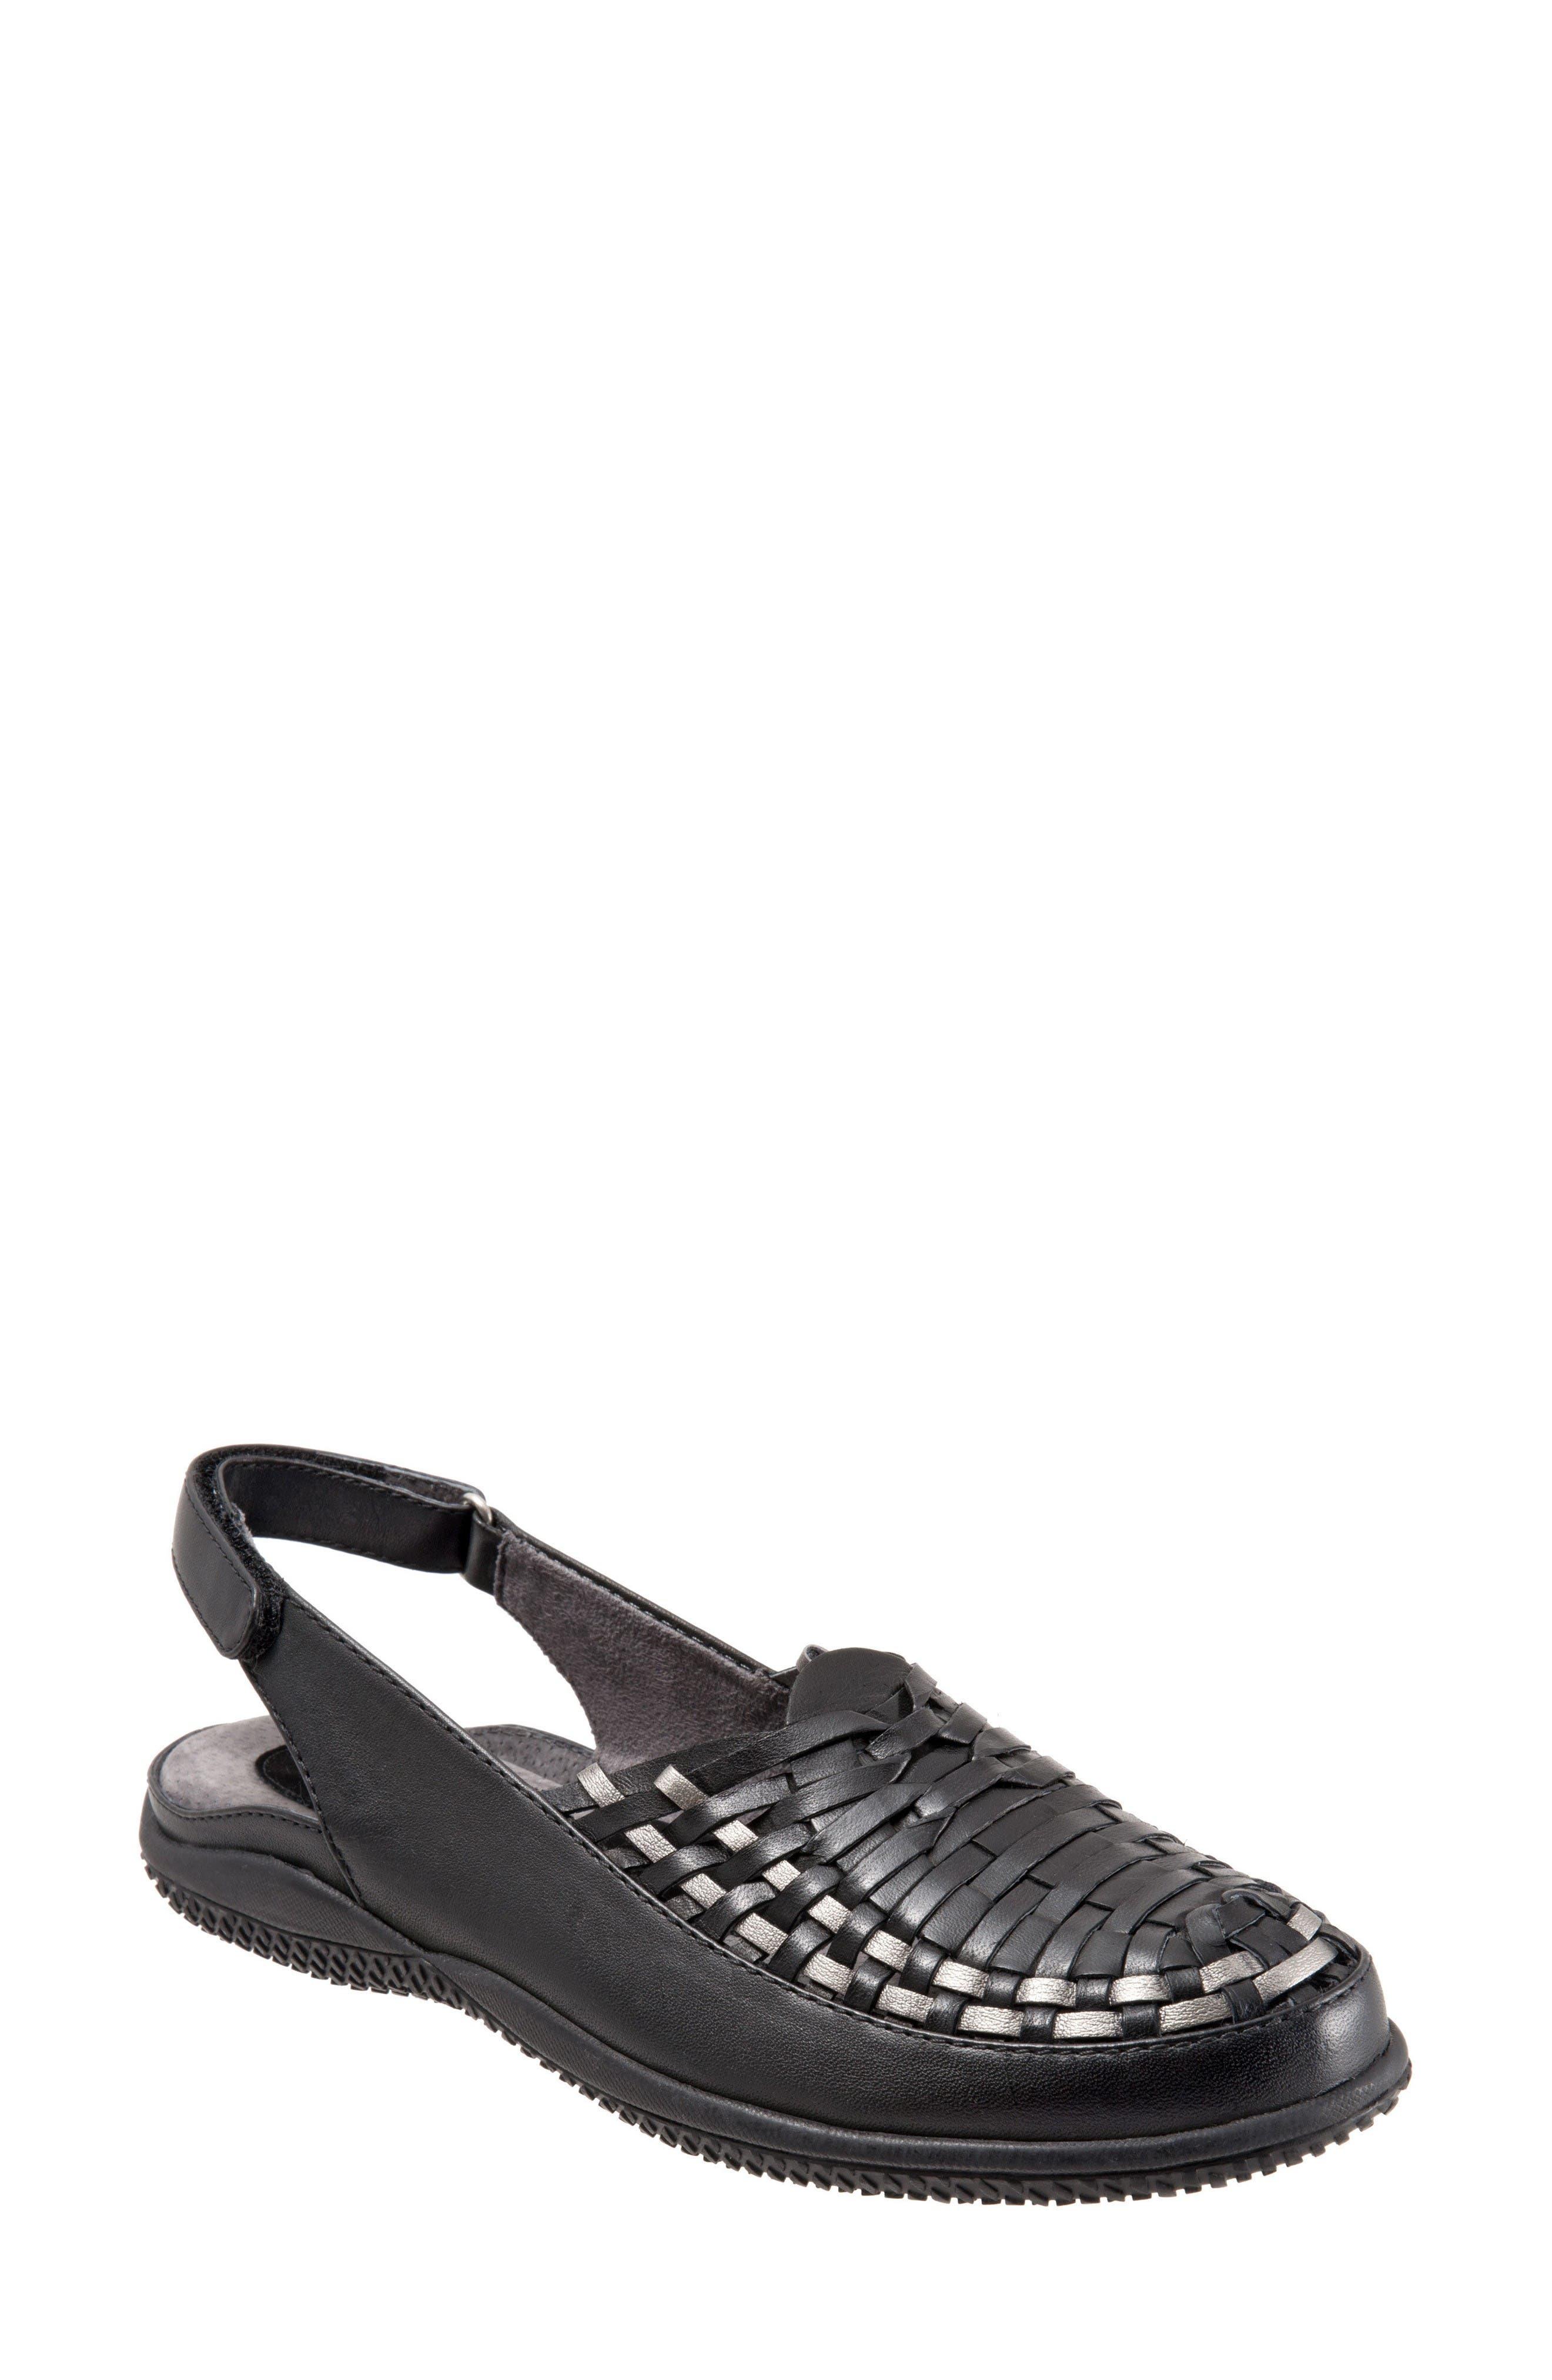 Harper Slingback Clog,                             Main thumbnail 1, color,                             Black/ Pewter Leather